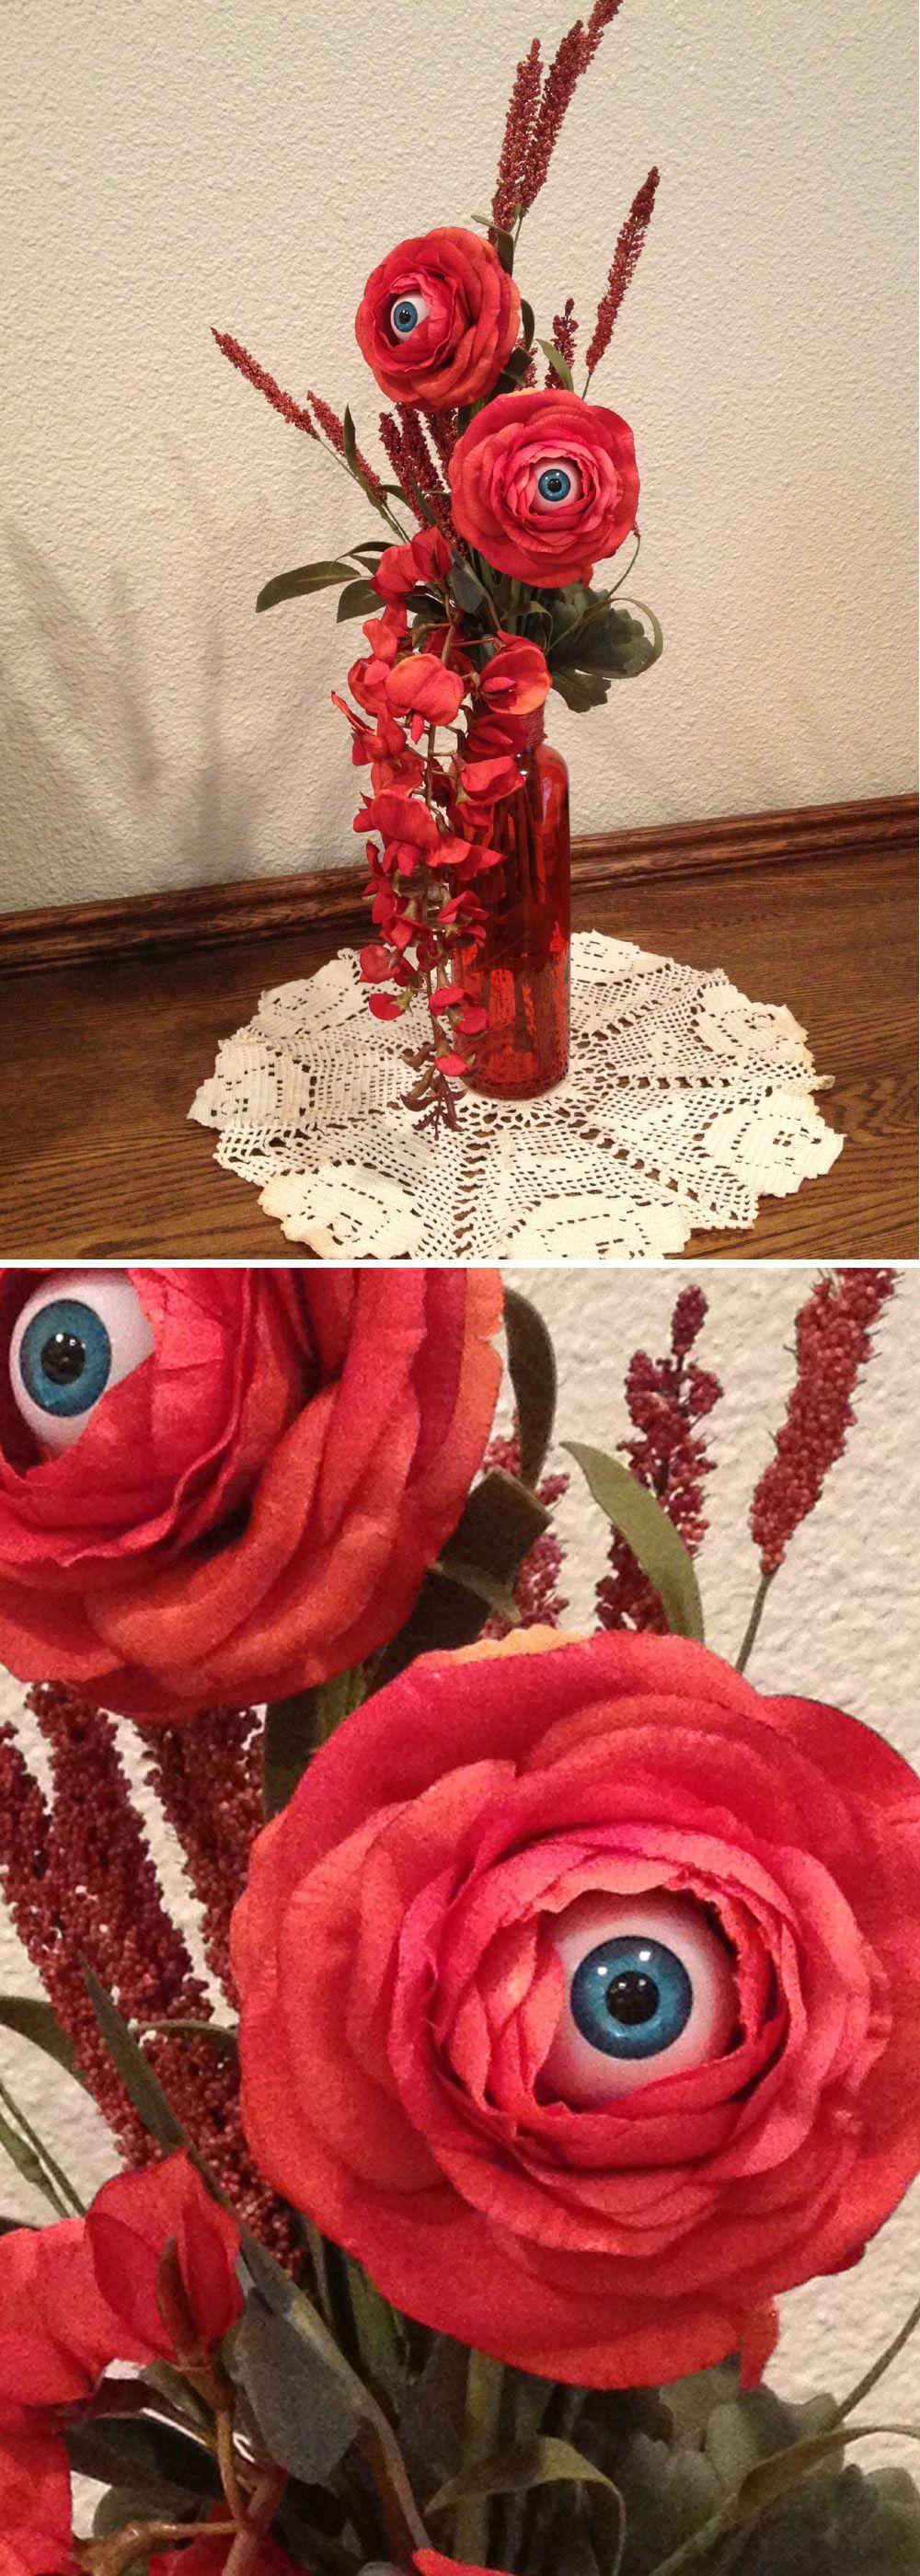 inspiration - creepy eyeball flowers - blue eyes (no specified